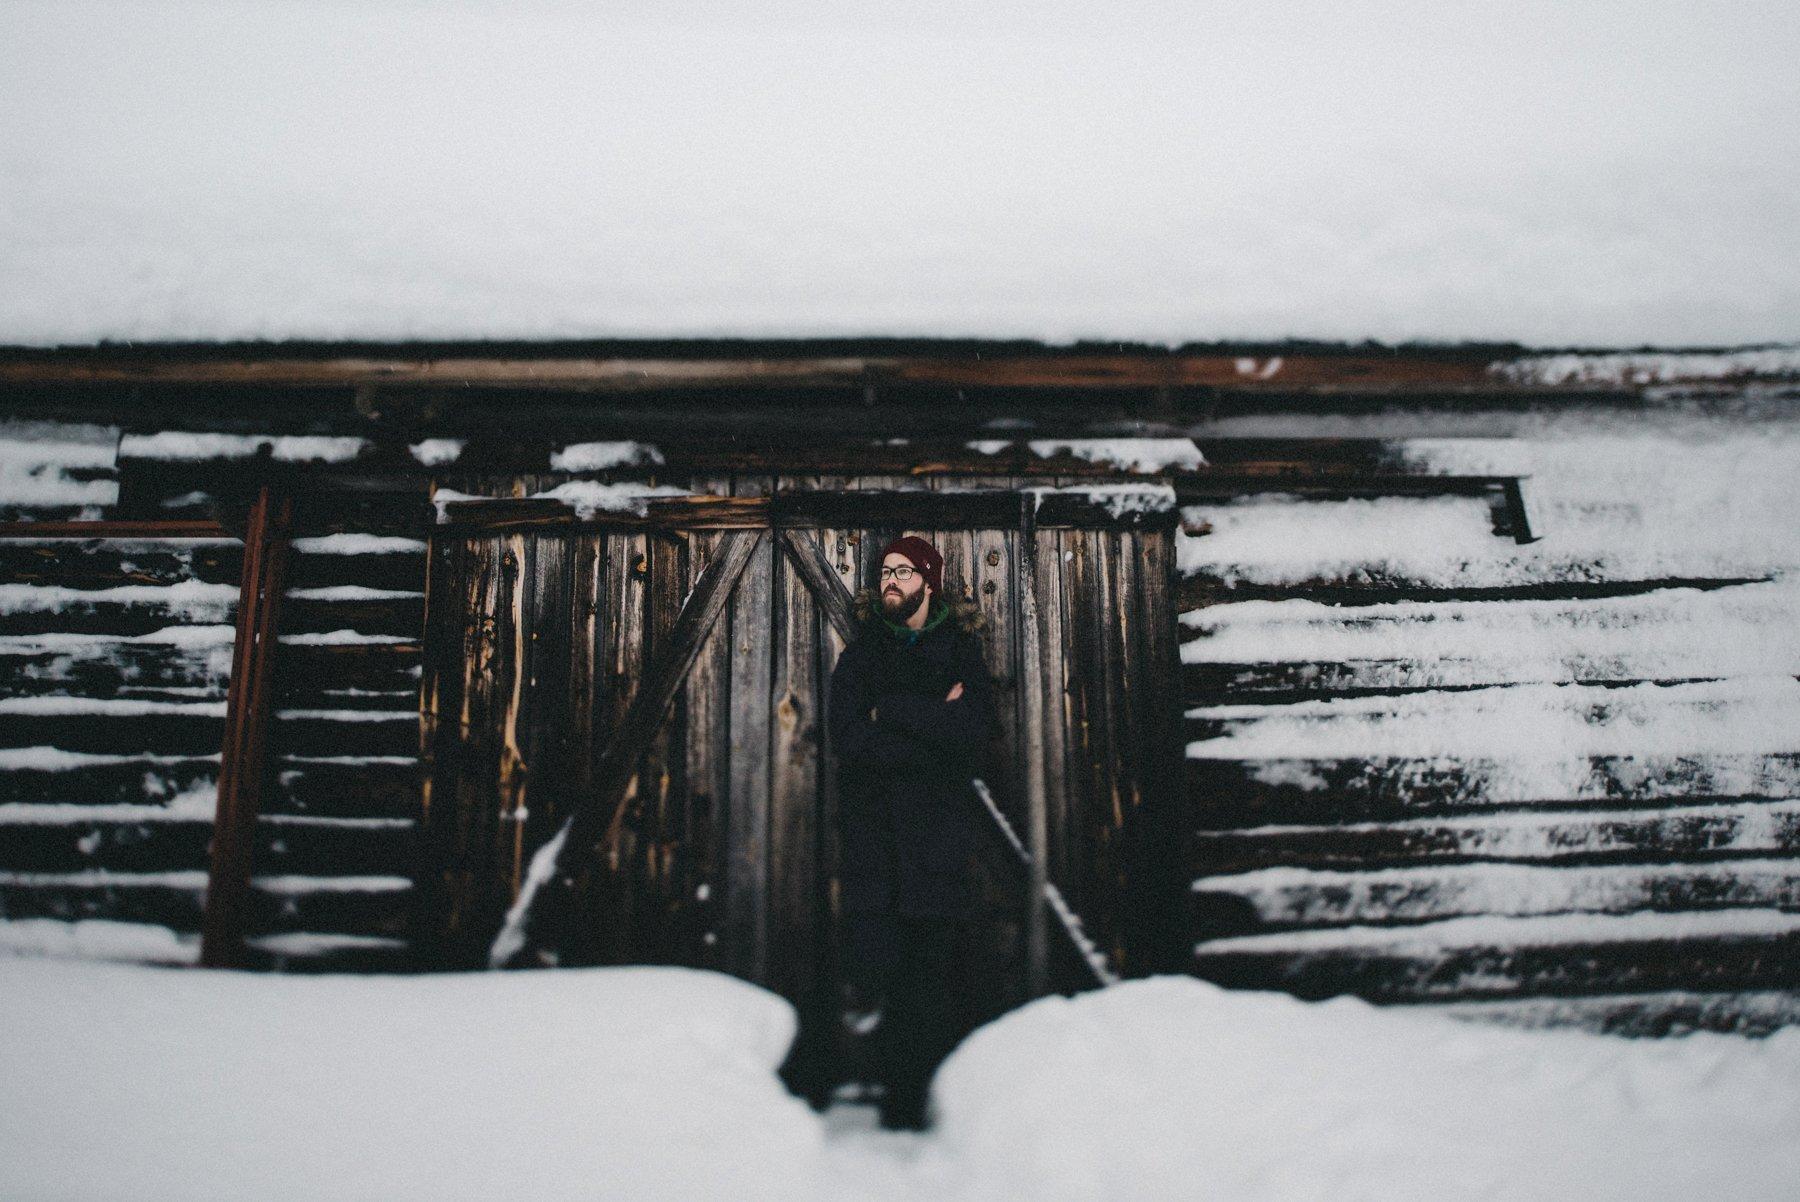 reisefotografie-lappland-finnland-146